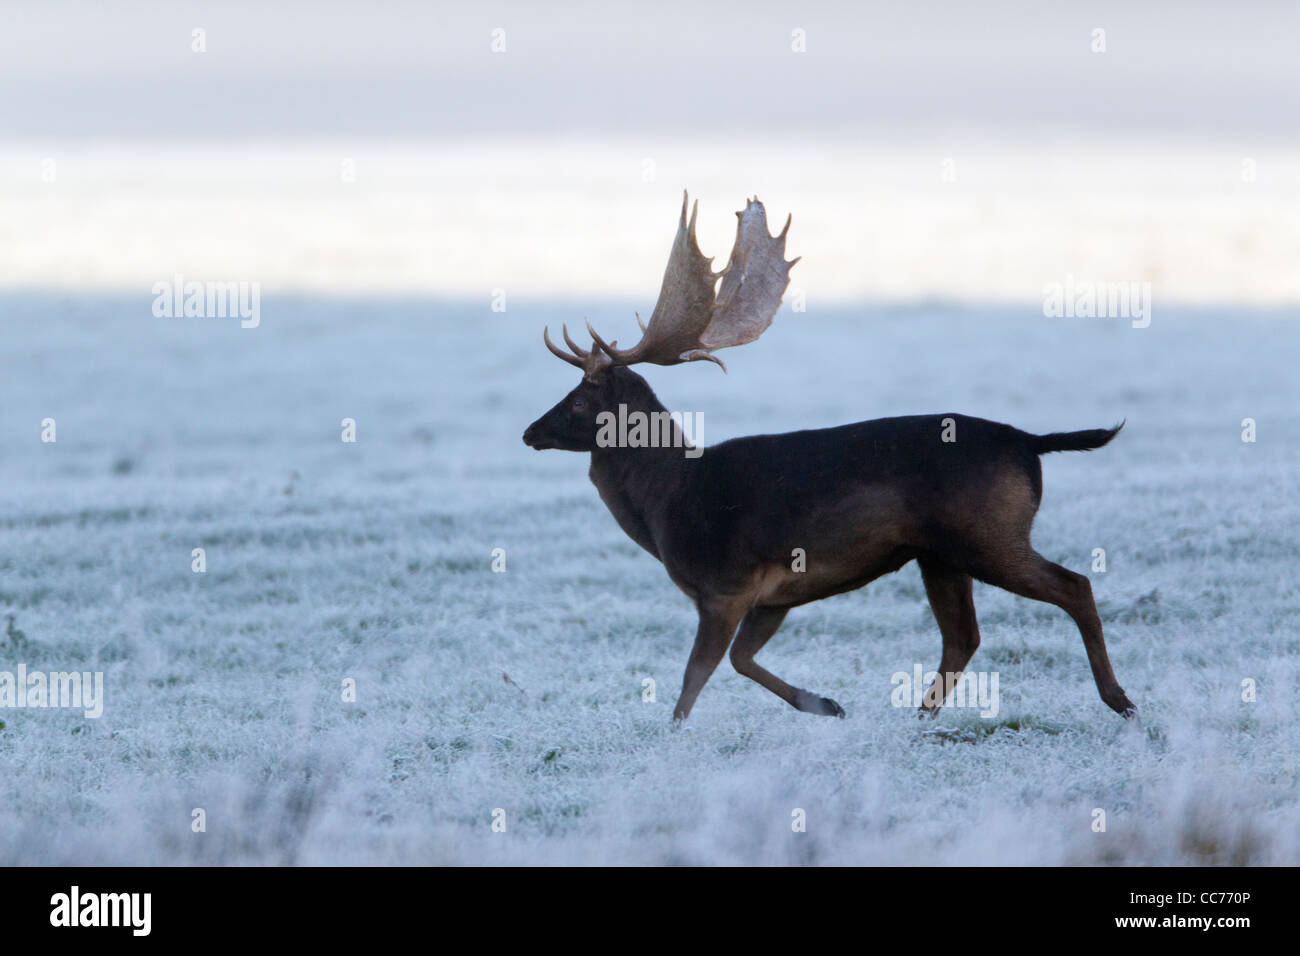 Fallow Deer (Dama dama), Black Buck Running, during the Rut, Royal Deer Park, Klampenborg, Copenhagen, Sjaelland, Stock Photo